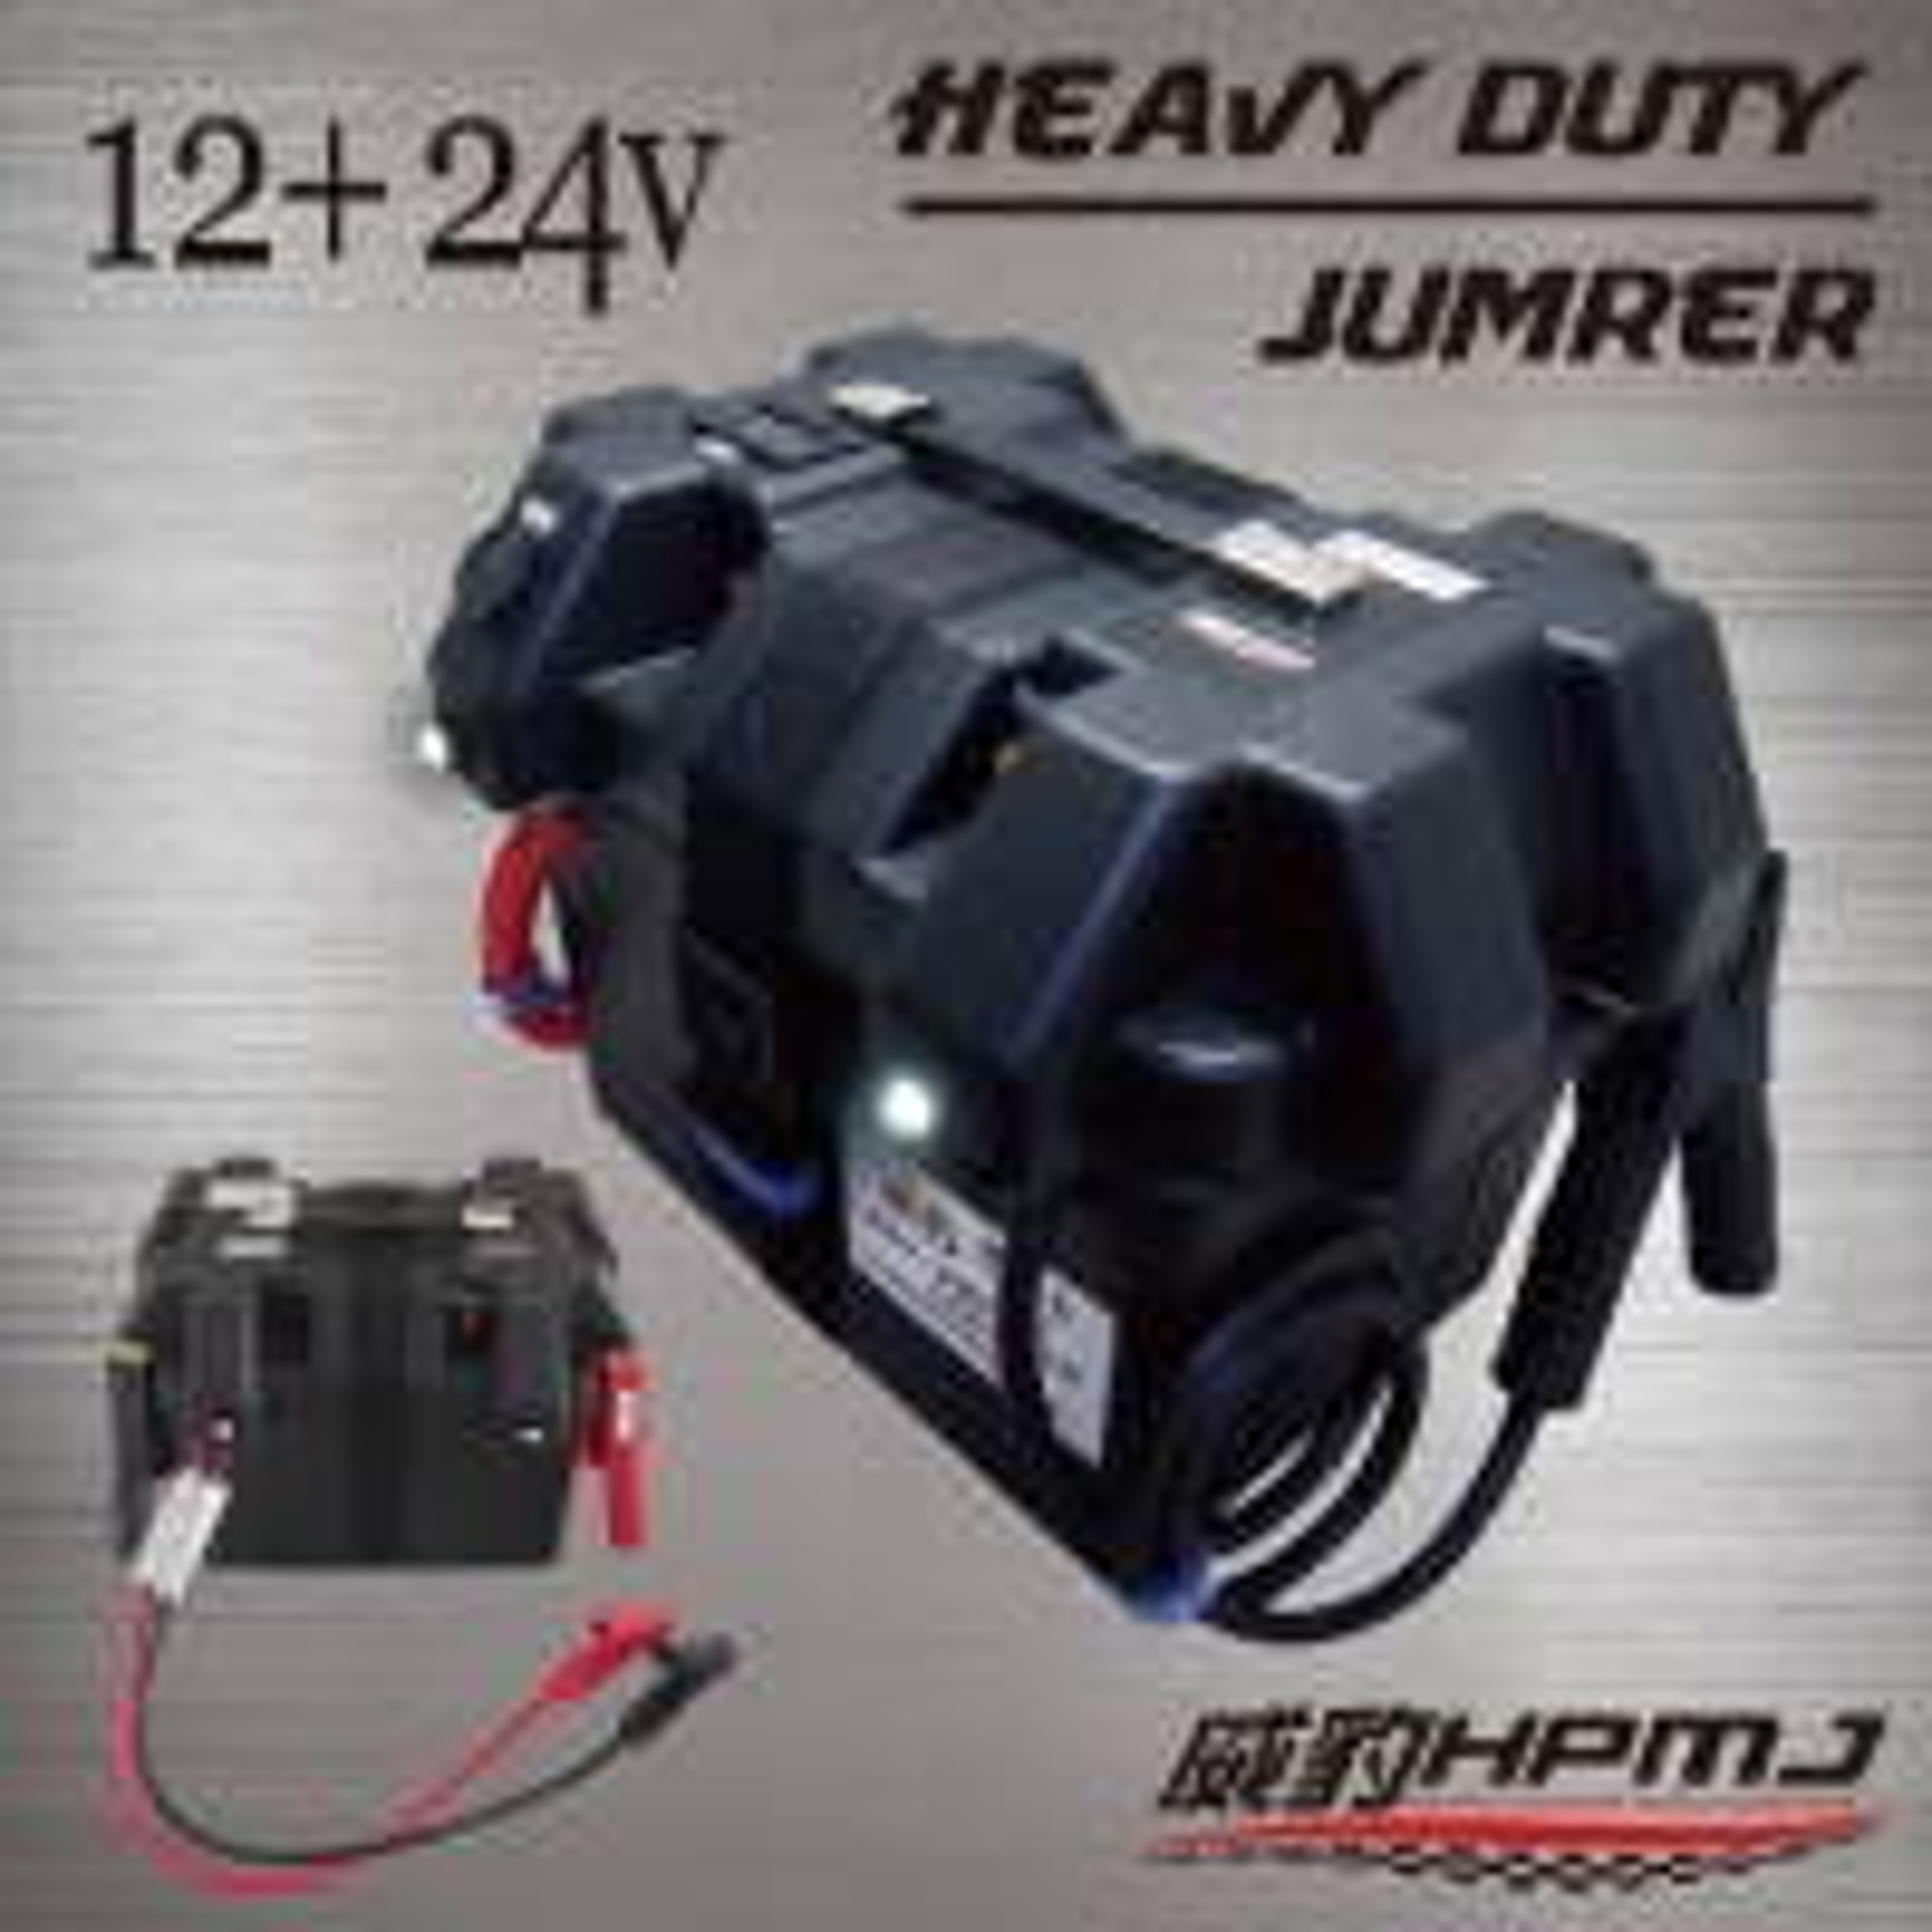 24V大型車救援/行動備用電源/汽車救援電源